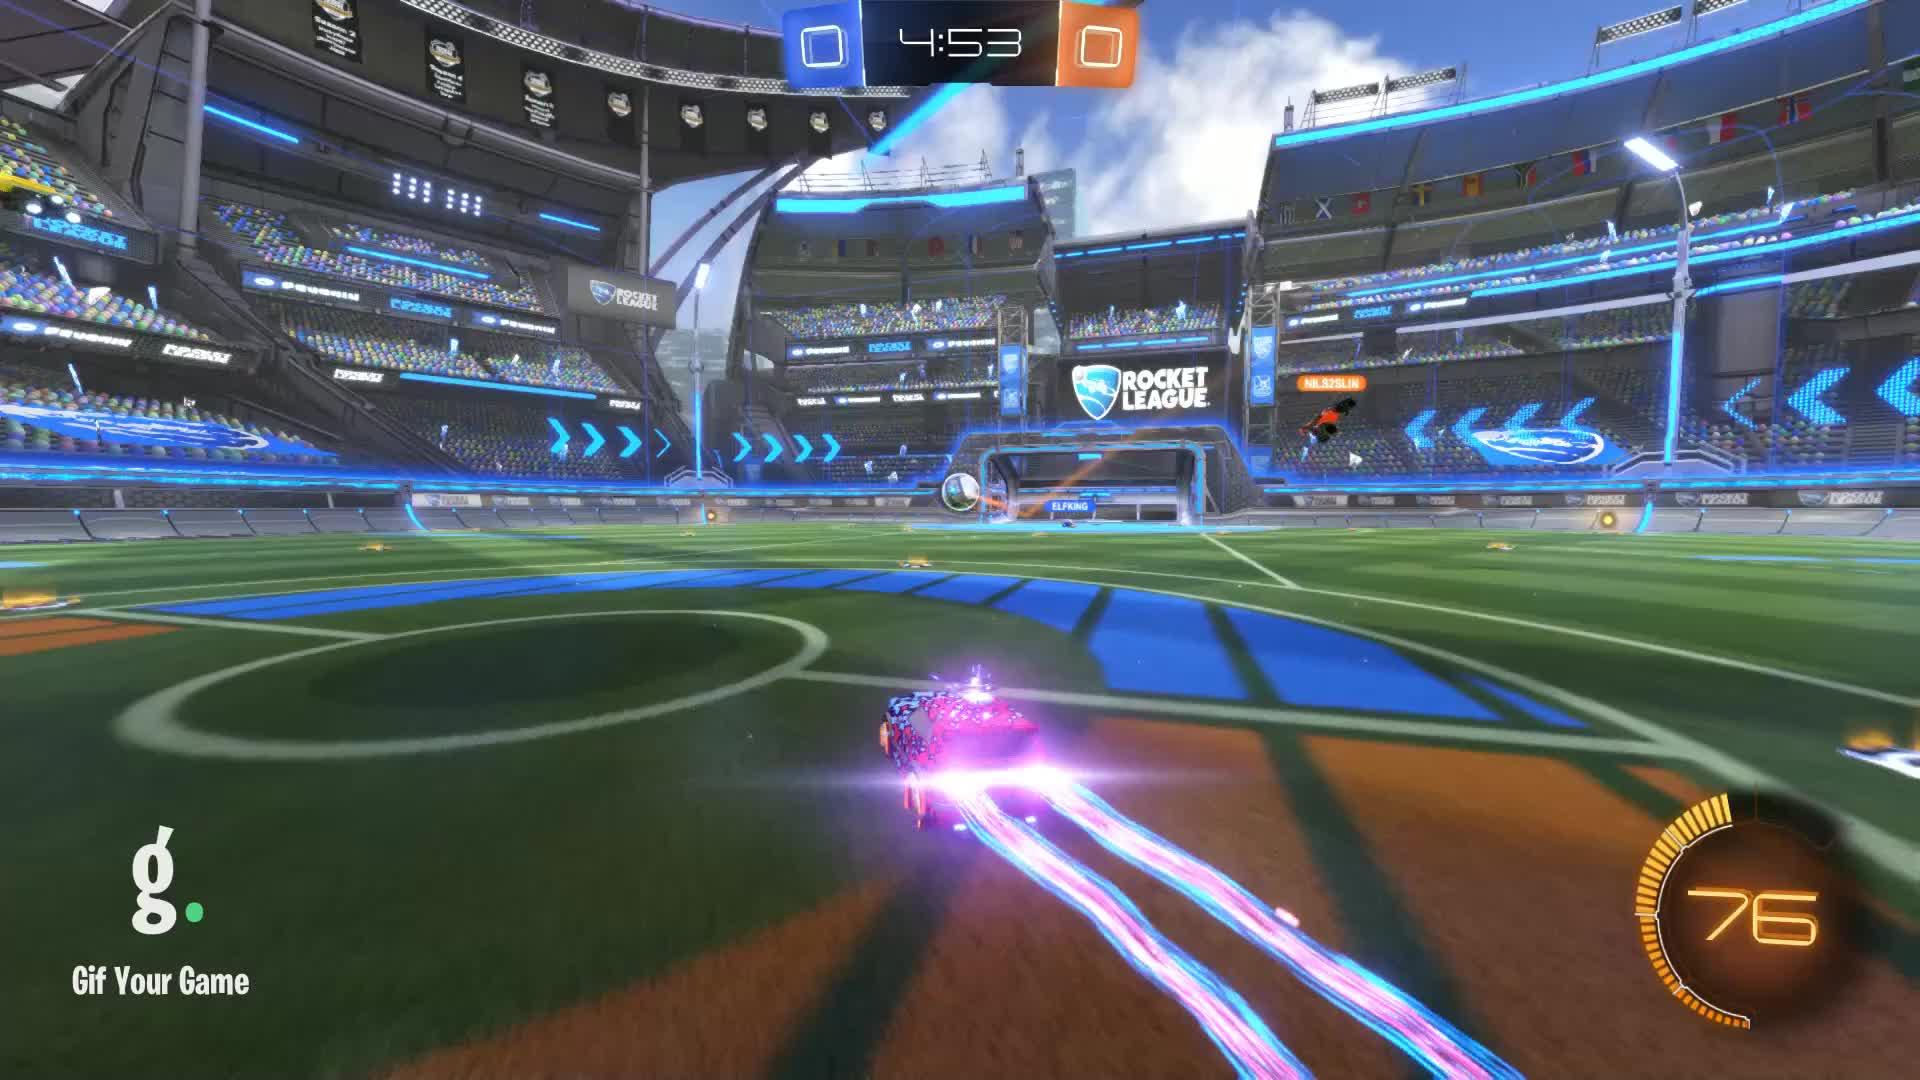 Gif Your Game, GifYourGame, Goal, LordTempestX, Rocket League, RocketLeague, Goal 1: LordTempestX GIFs